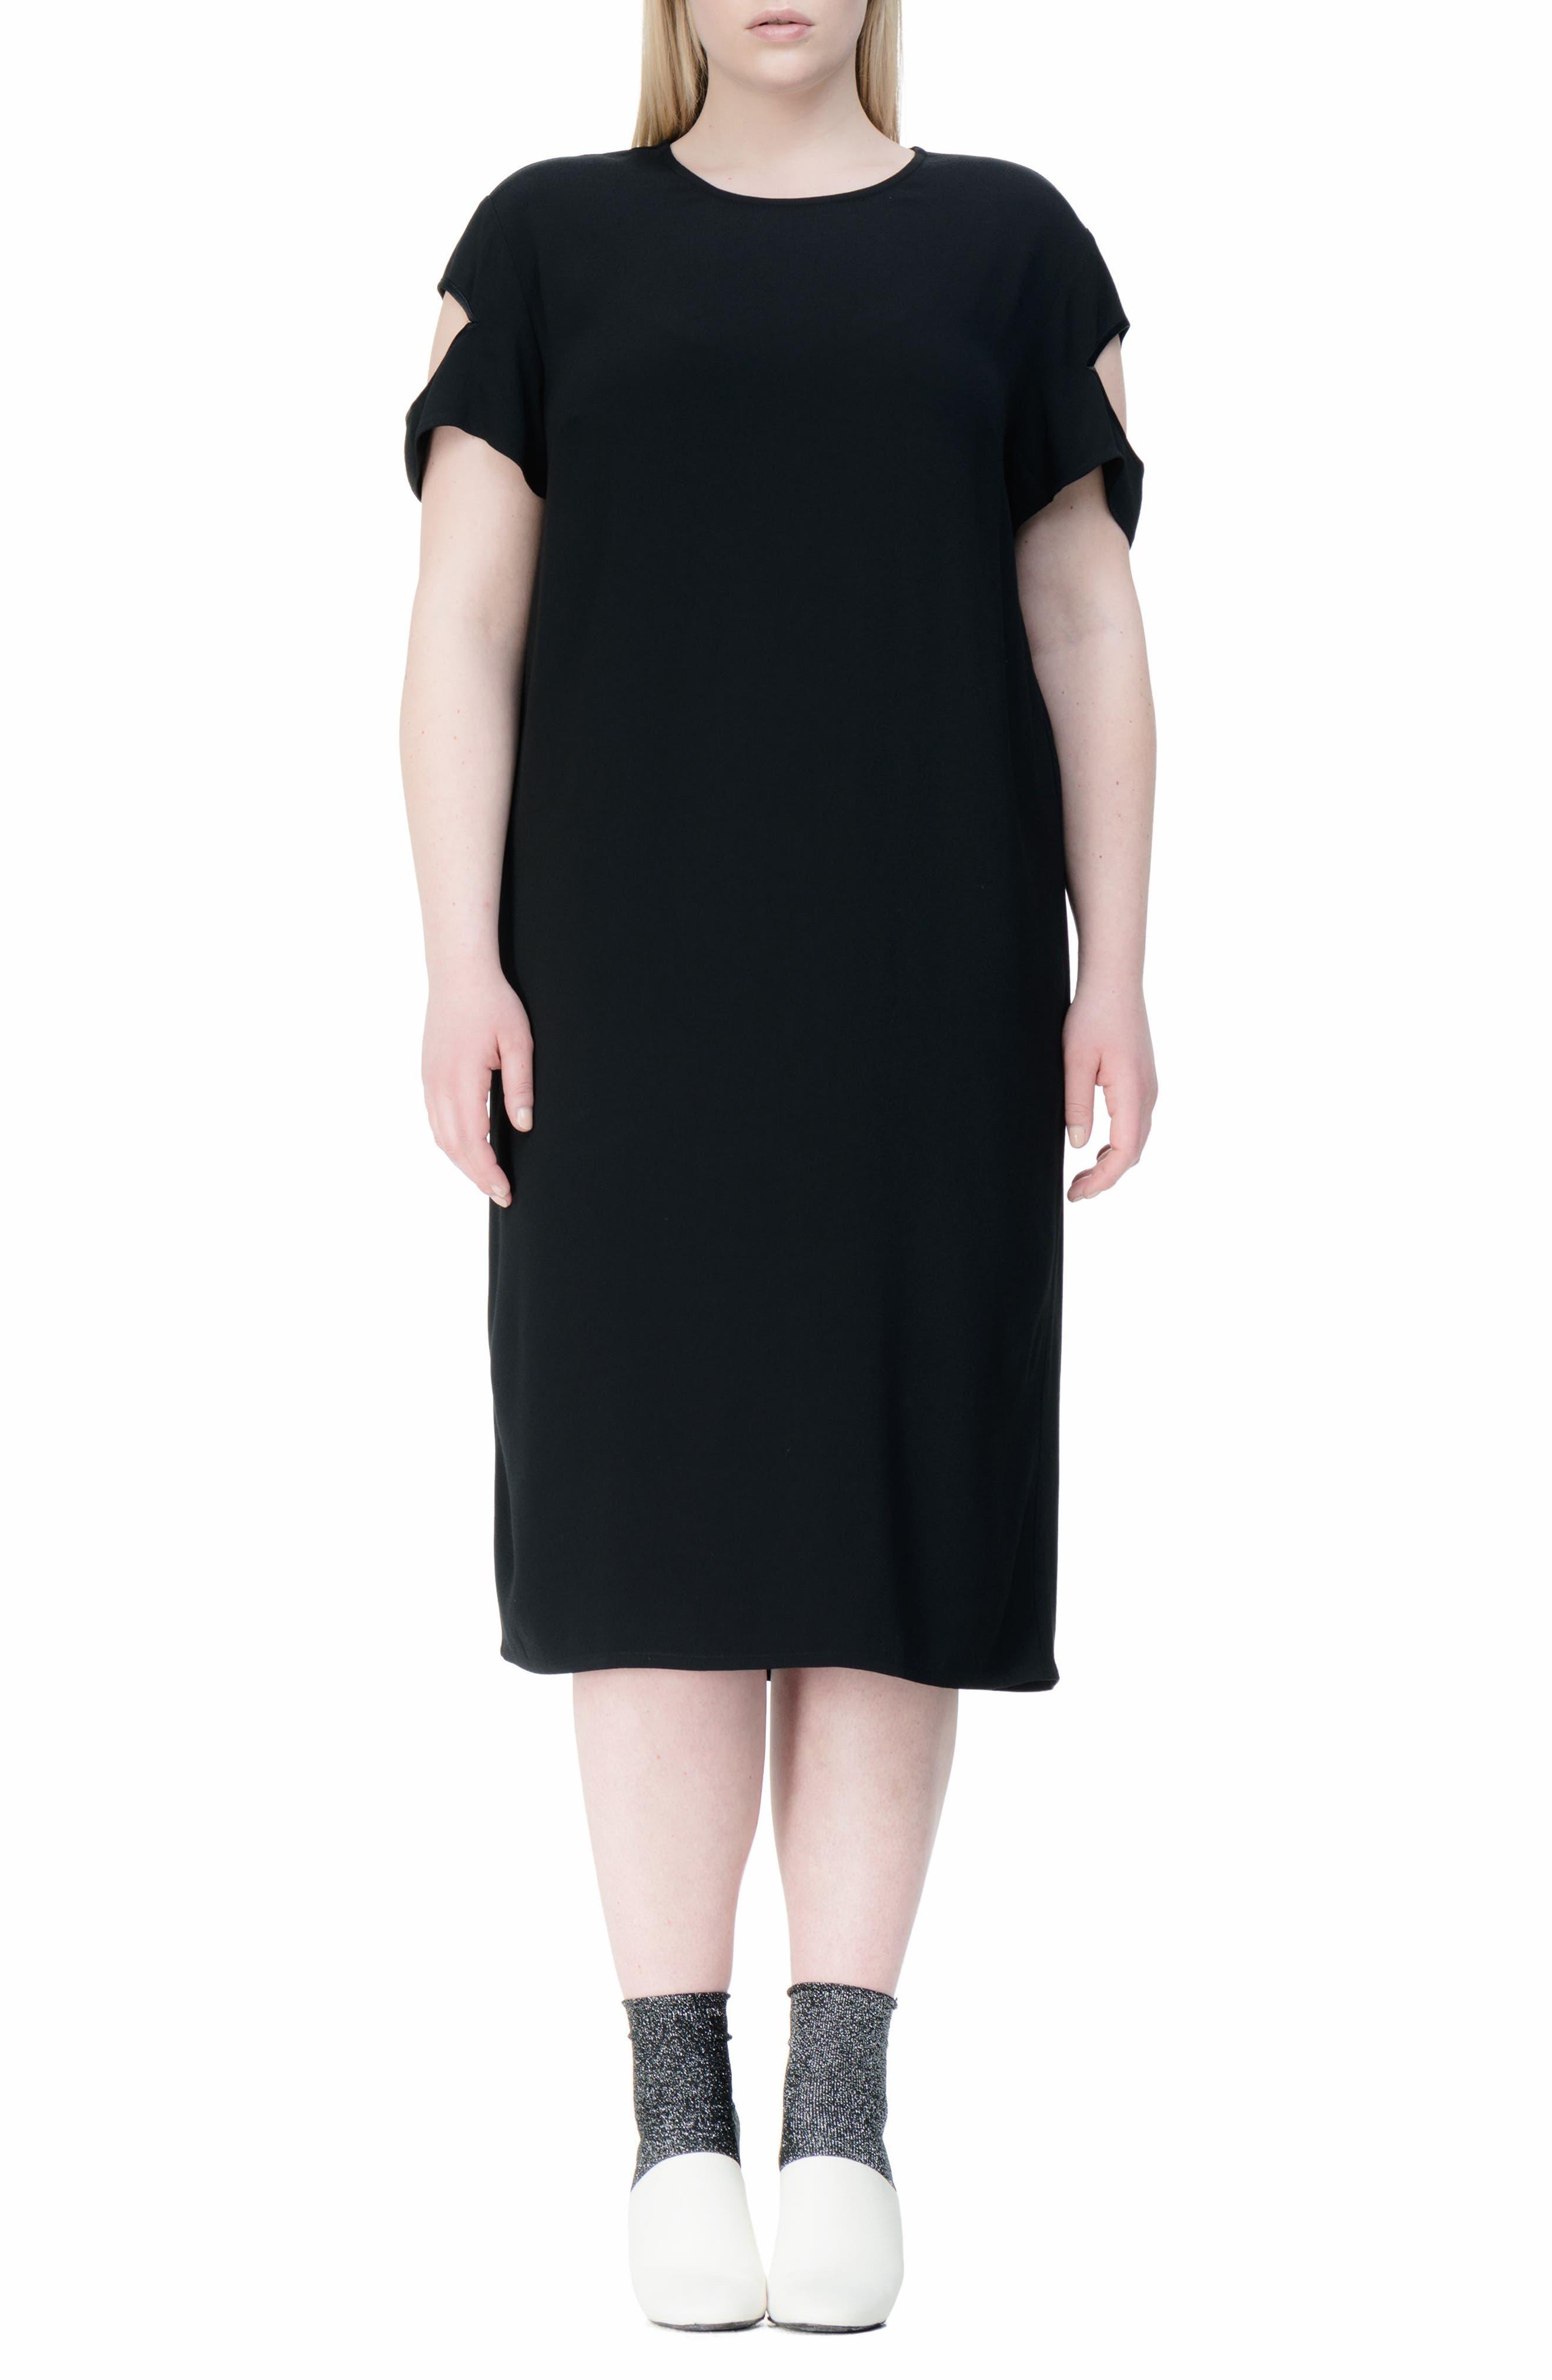 Alternate Image 1 Selected - UNIVERSAL STANDARD Newland Shift Dress (Plus Size)